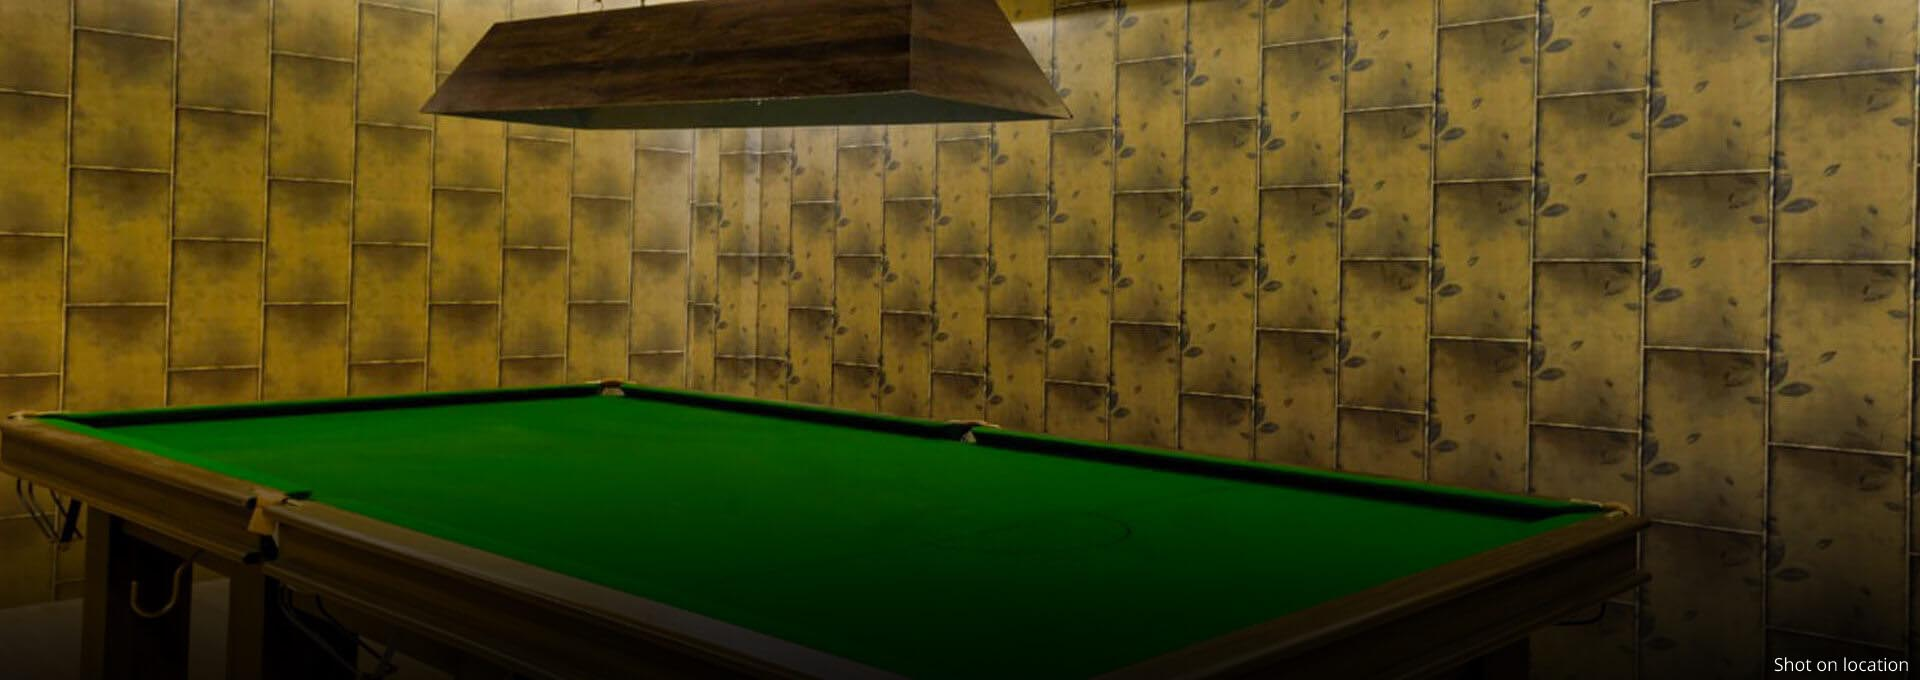 Billiards in Hill crest by House of Hirandani in Bannerghatta, Bengaluru